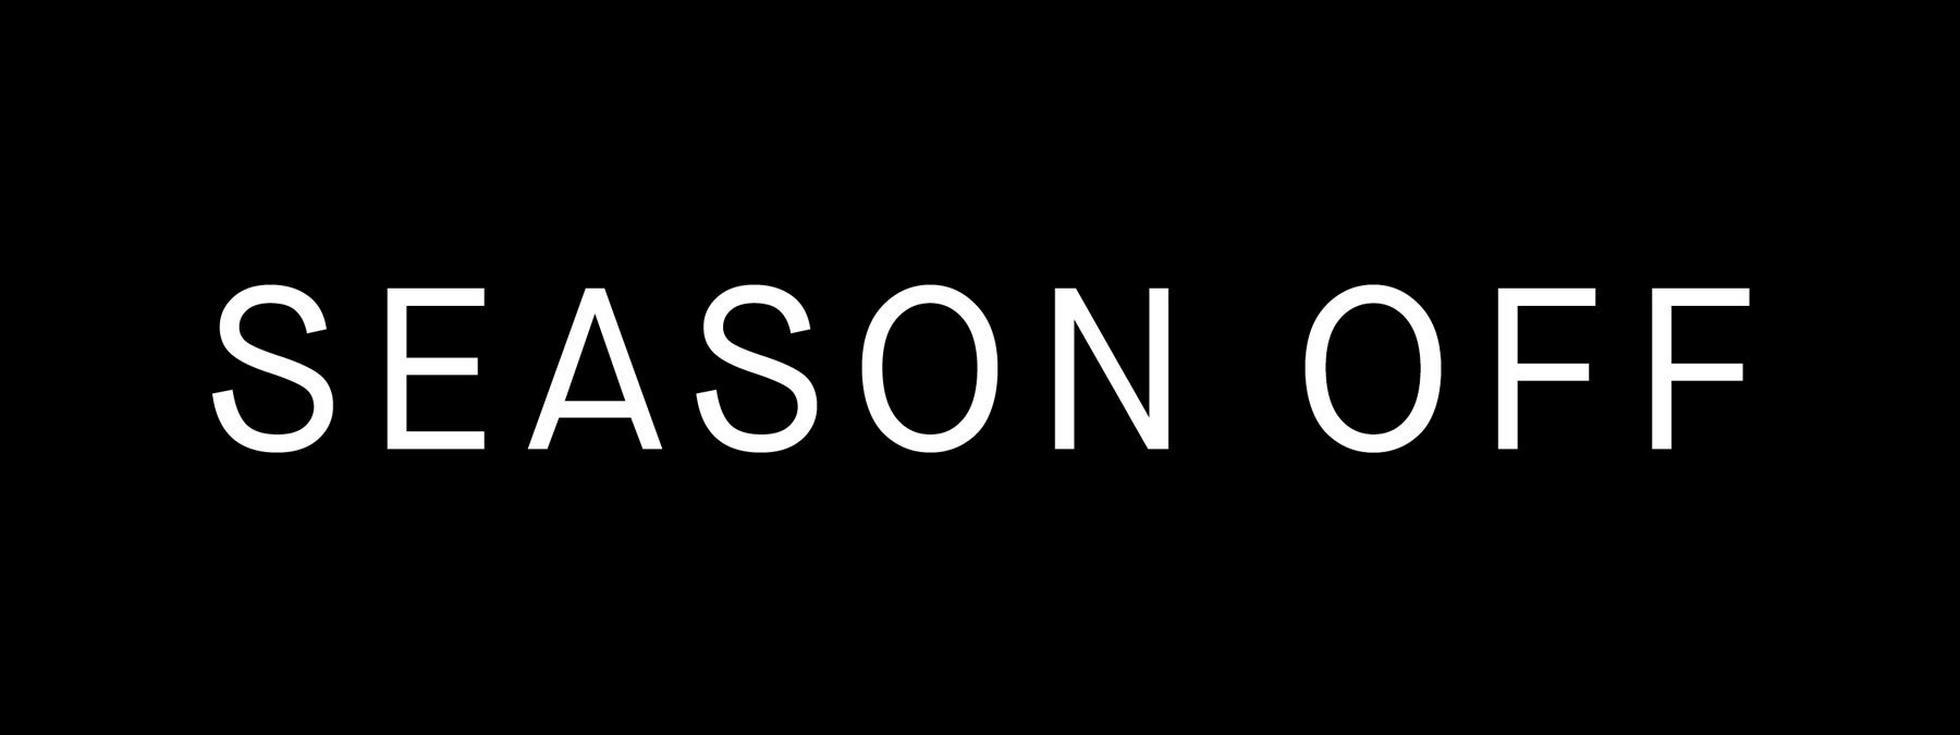 SS19 Season Off